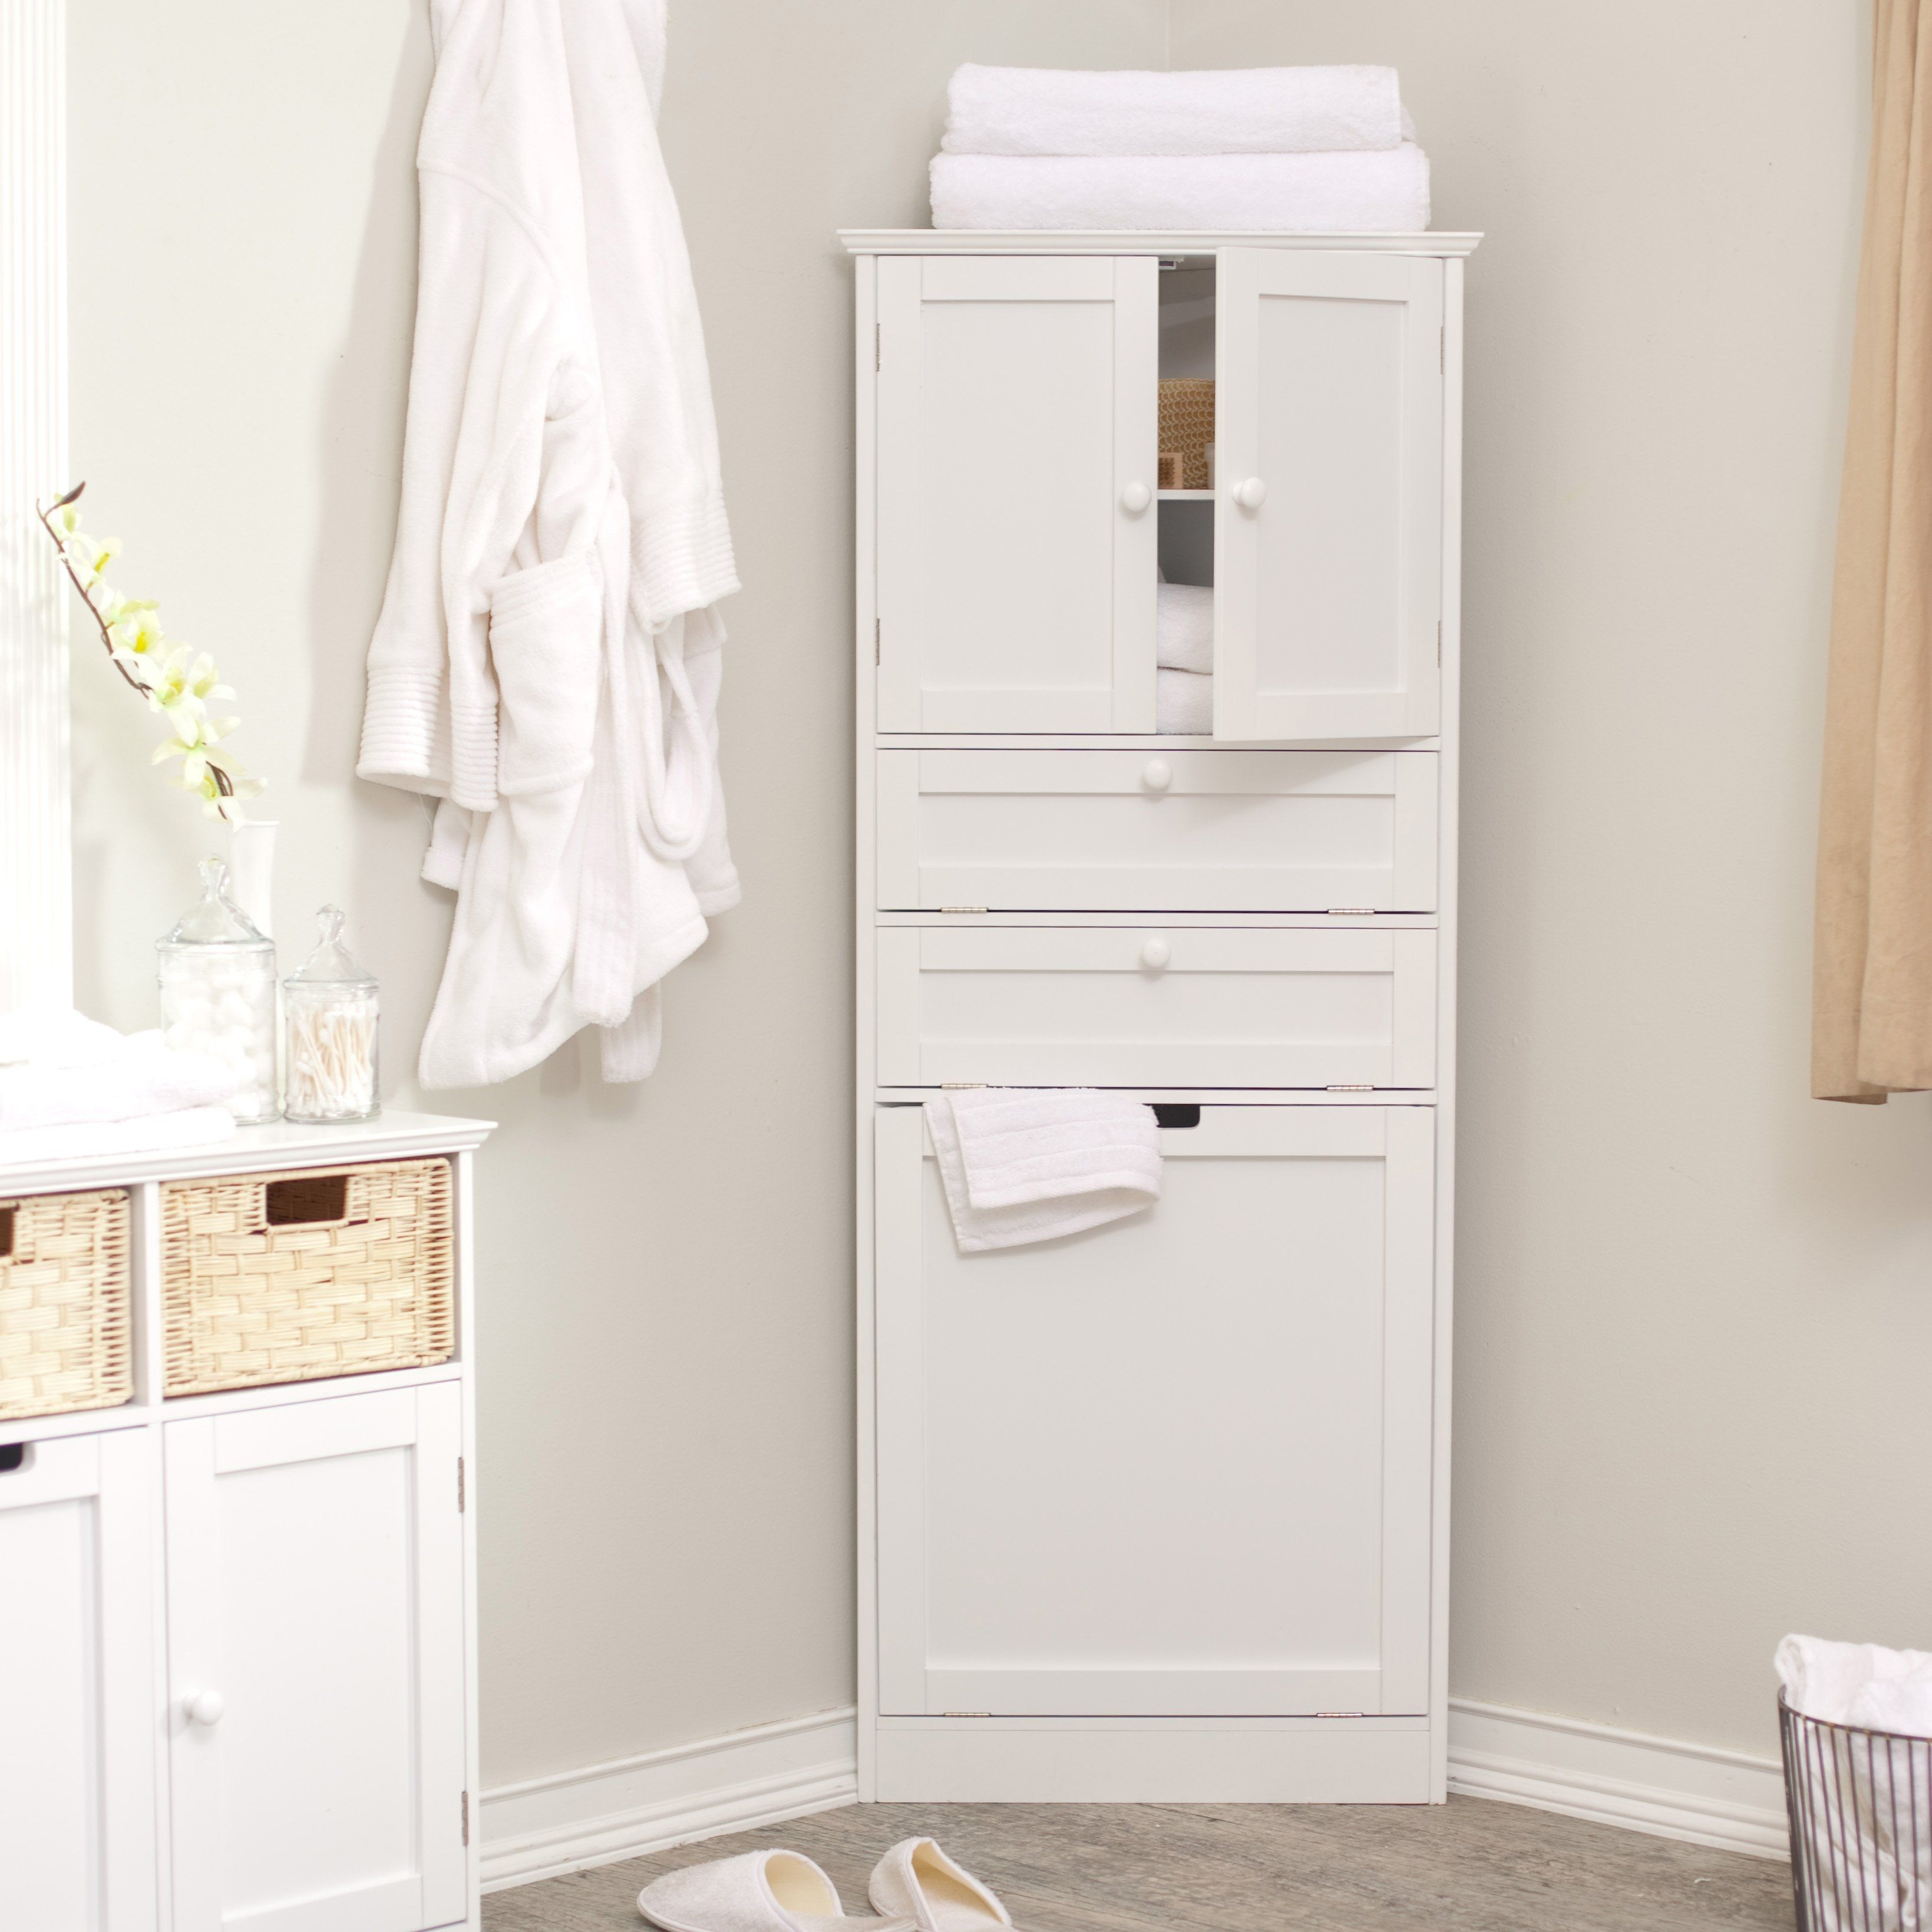 hight resolution of small corner bathroom storage cabinet